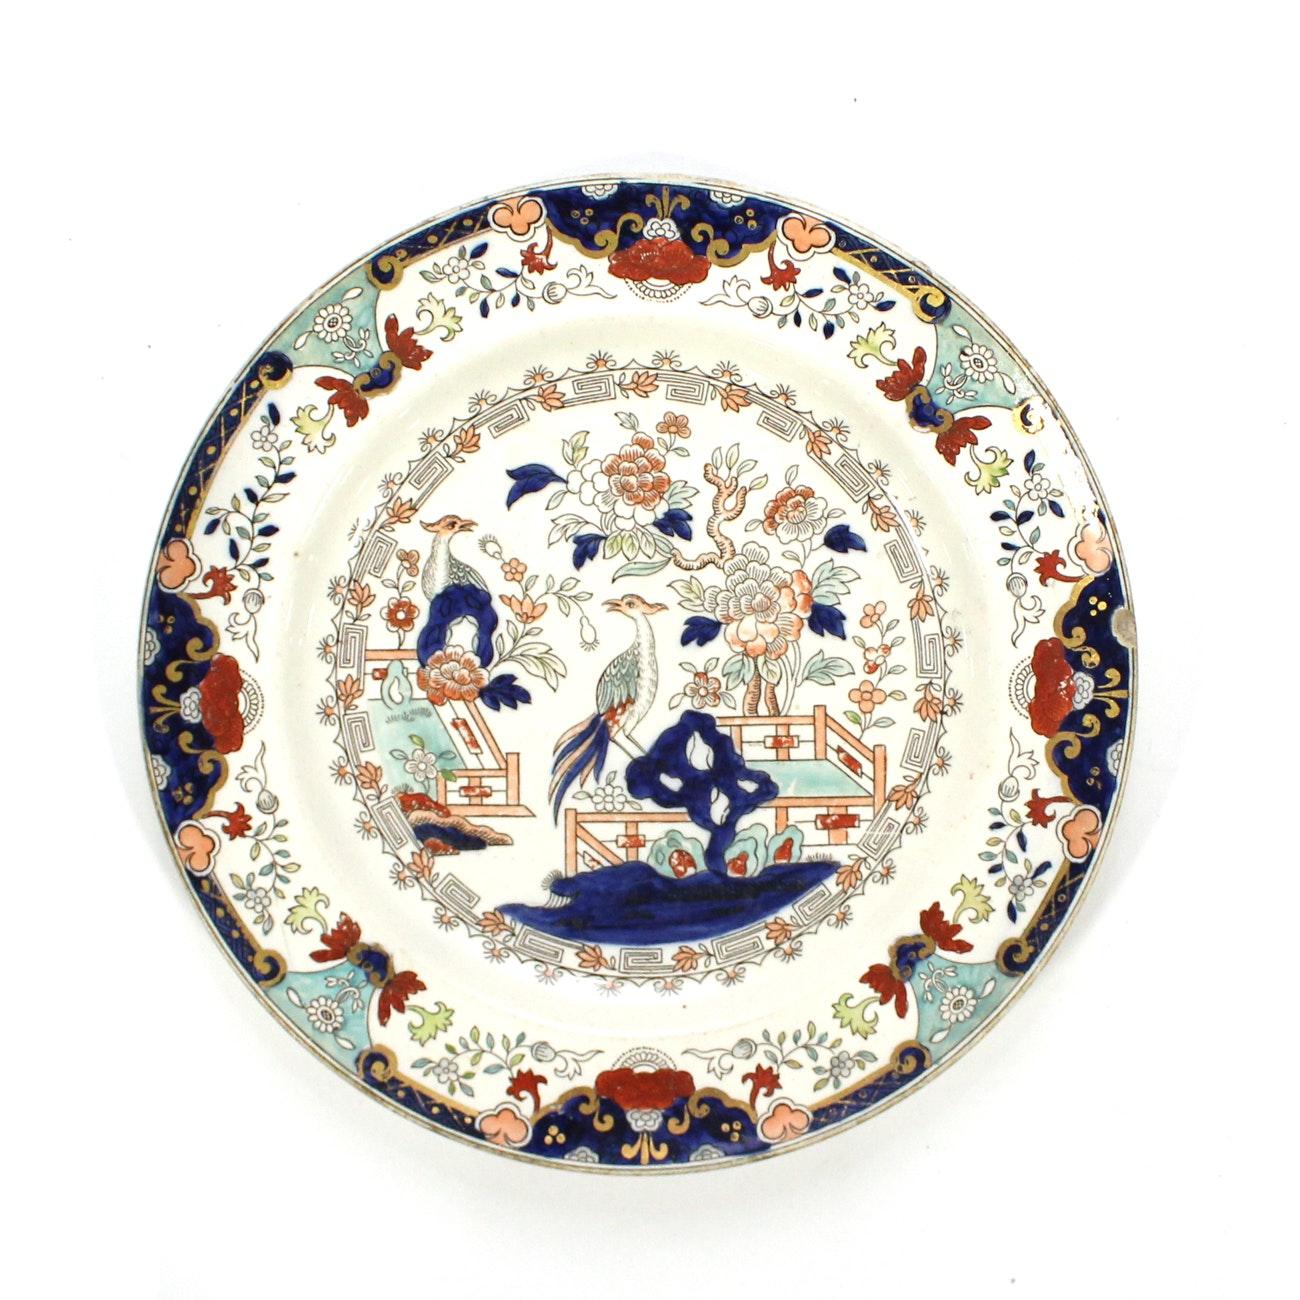 Ashworth Imari Design Ironstone Plate, 20th Century